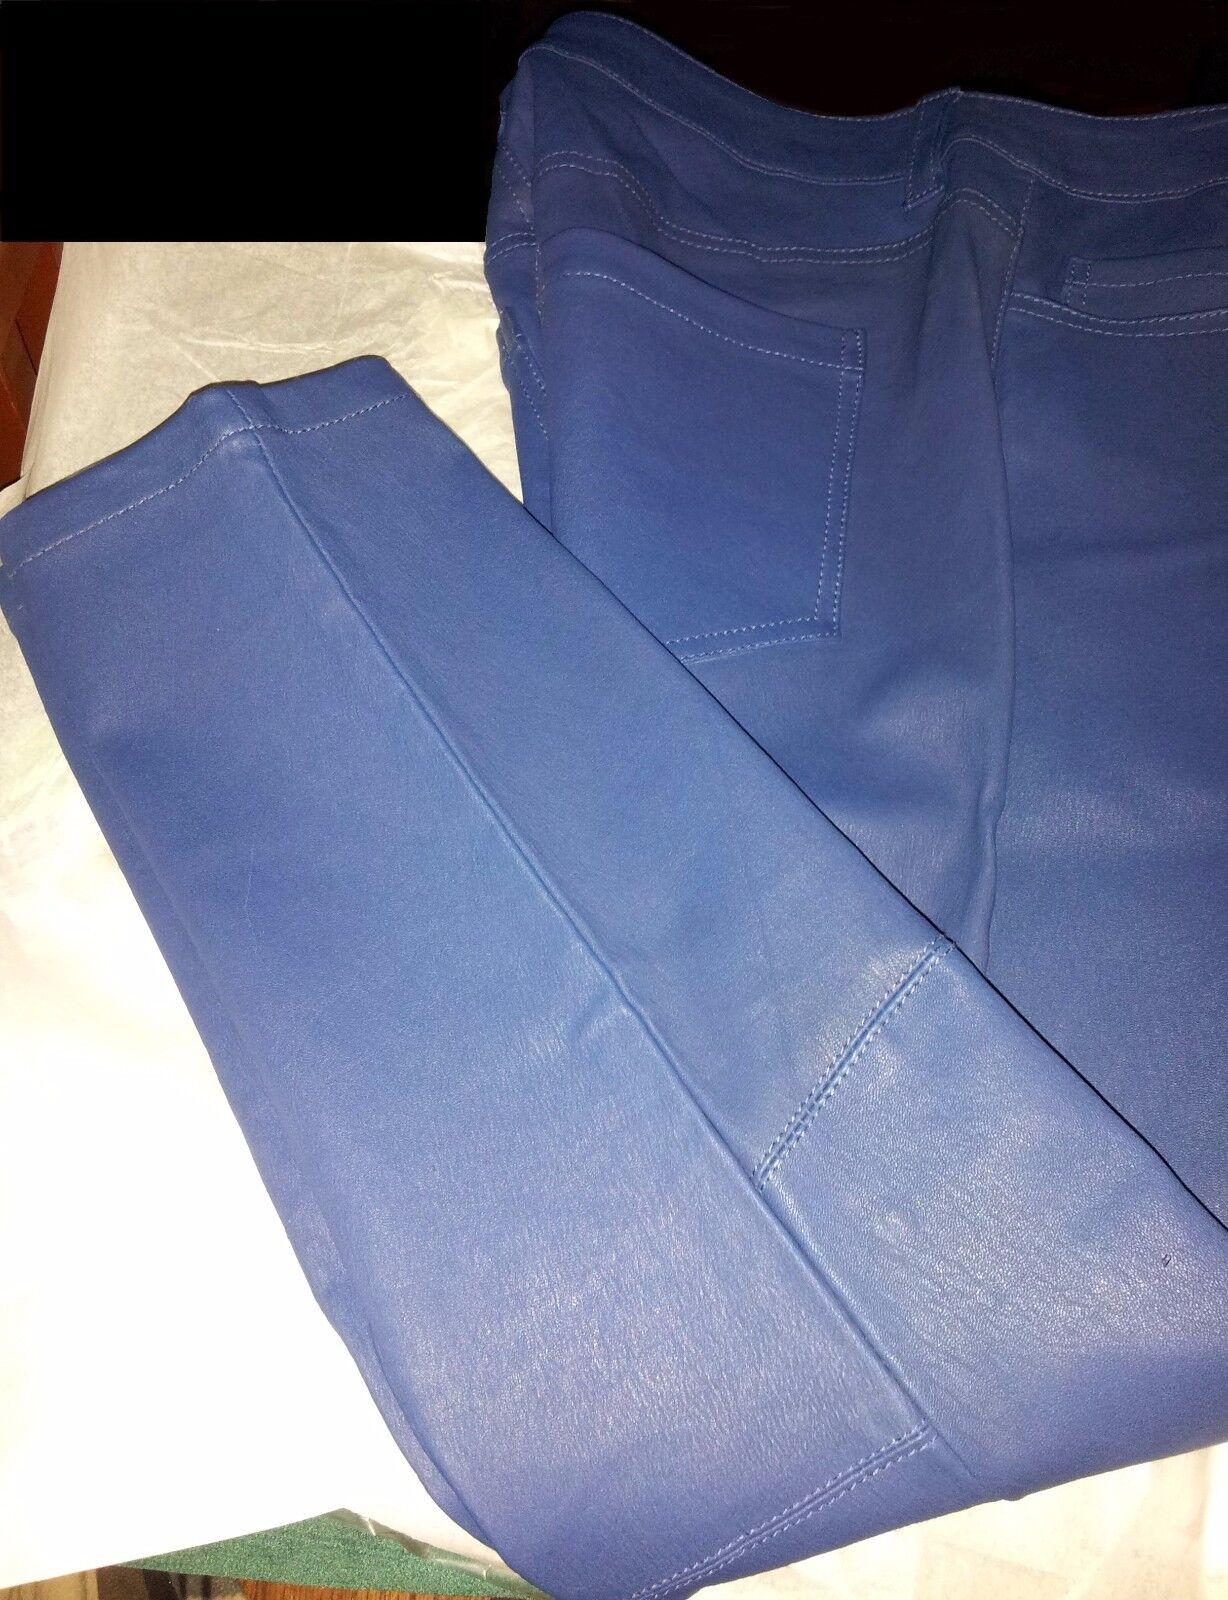 889 NEW L'Agence azul Lamb  Skin Leather Pants 34 W x 26 L  barato en alta calidad